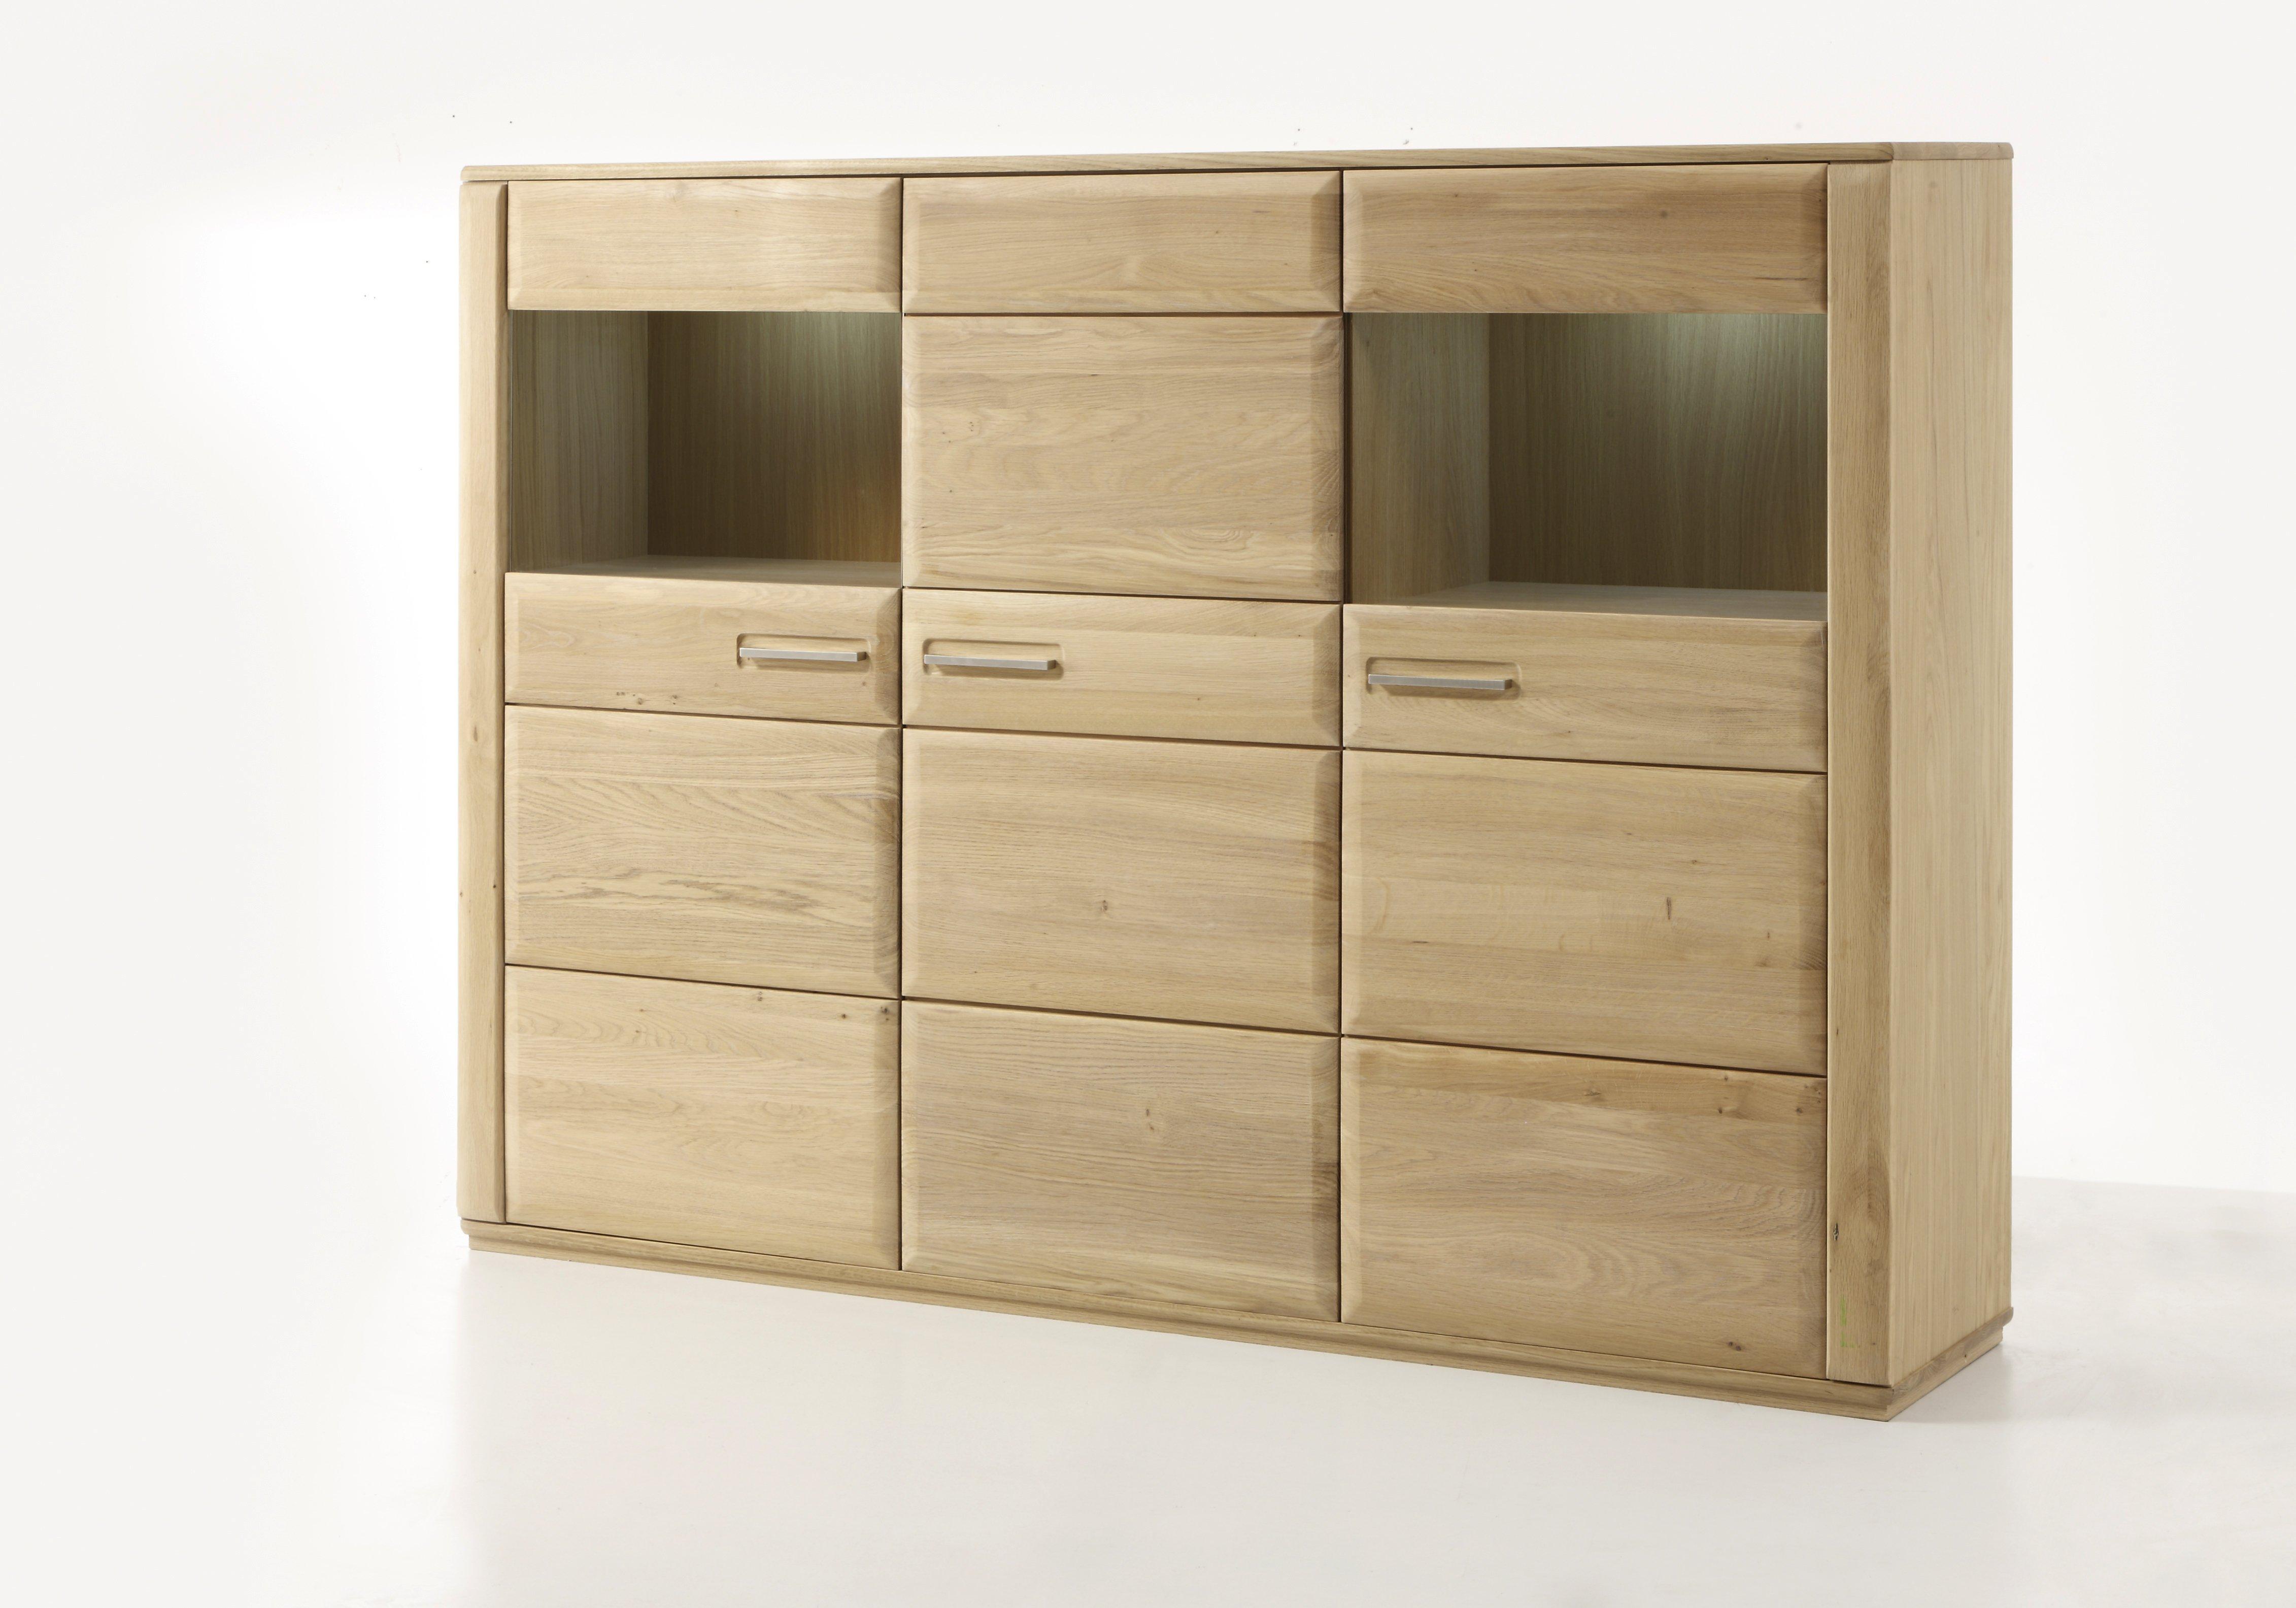 Highboard Sena T05 von MCA furniture